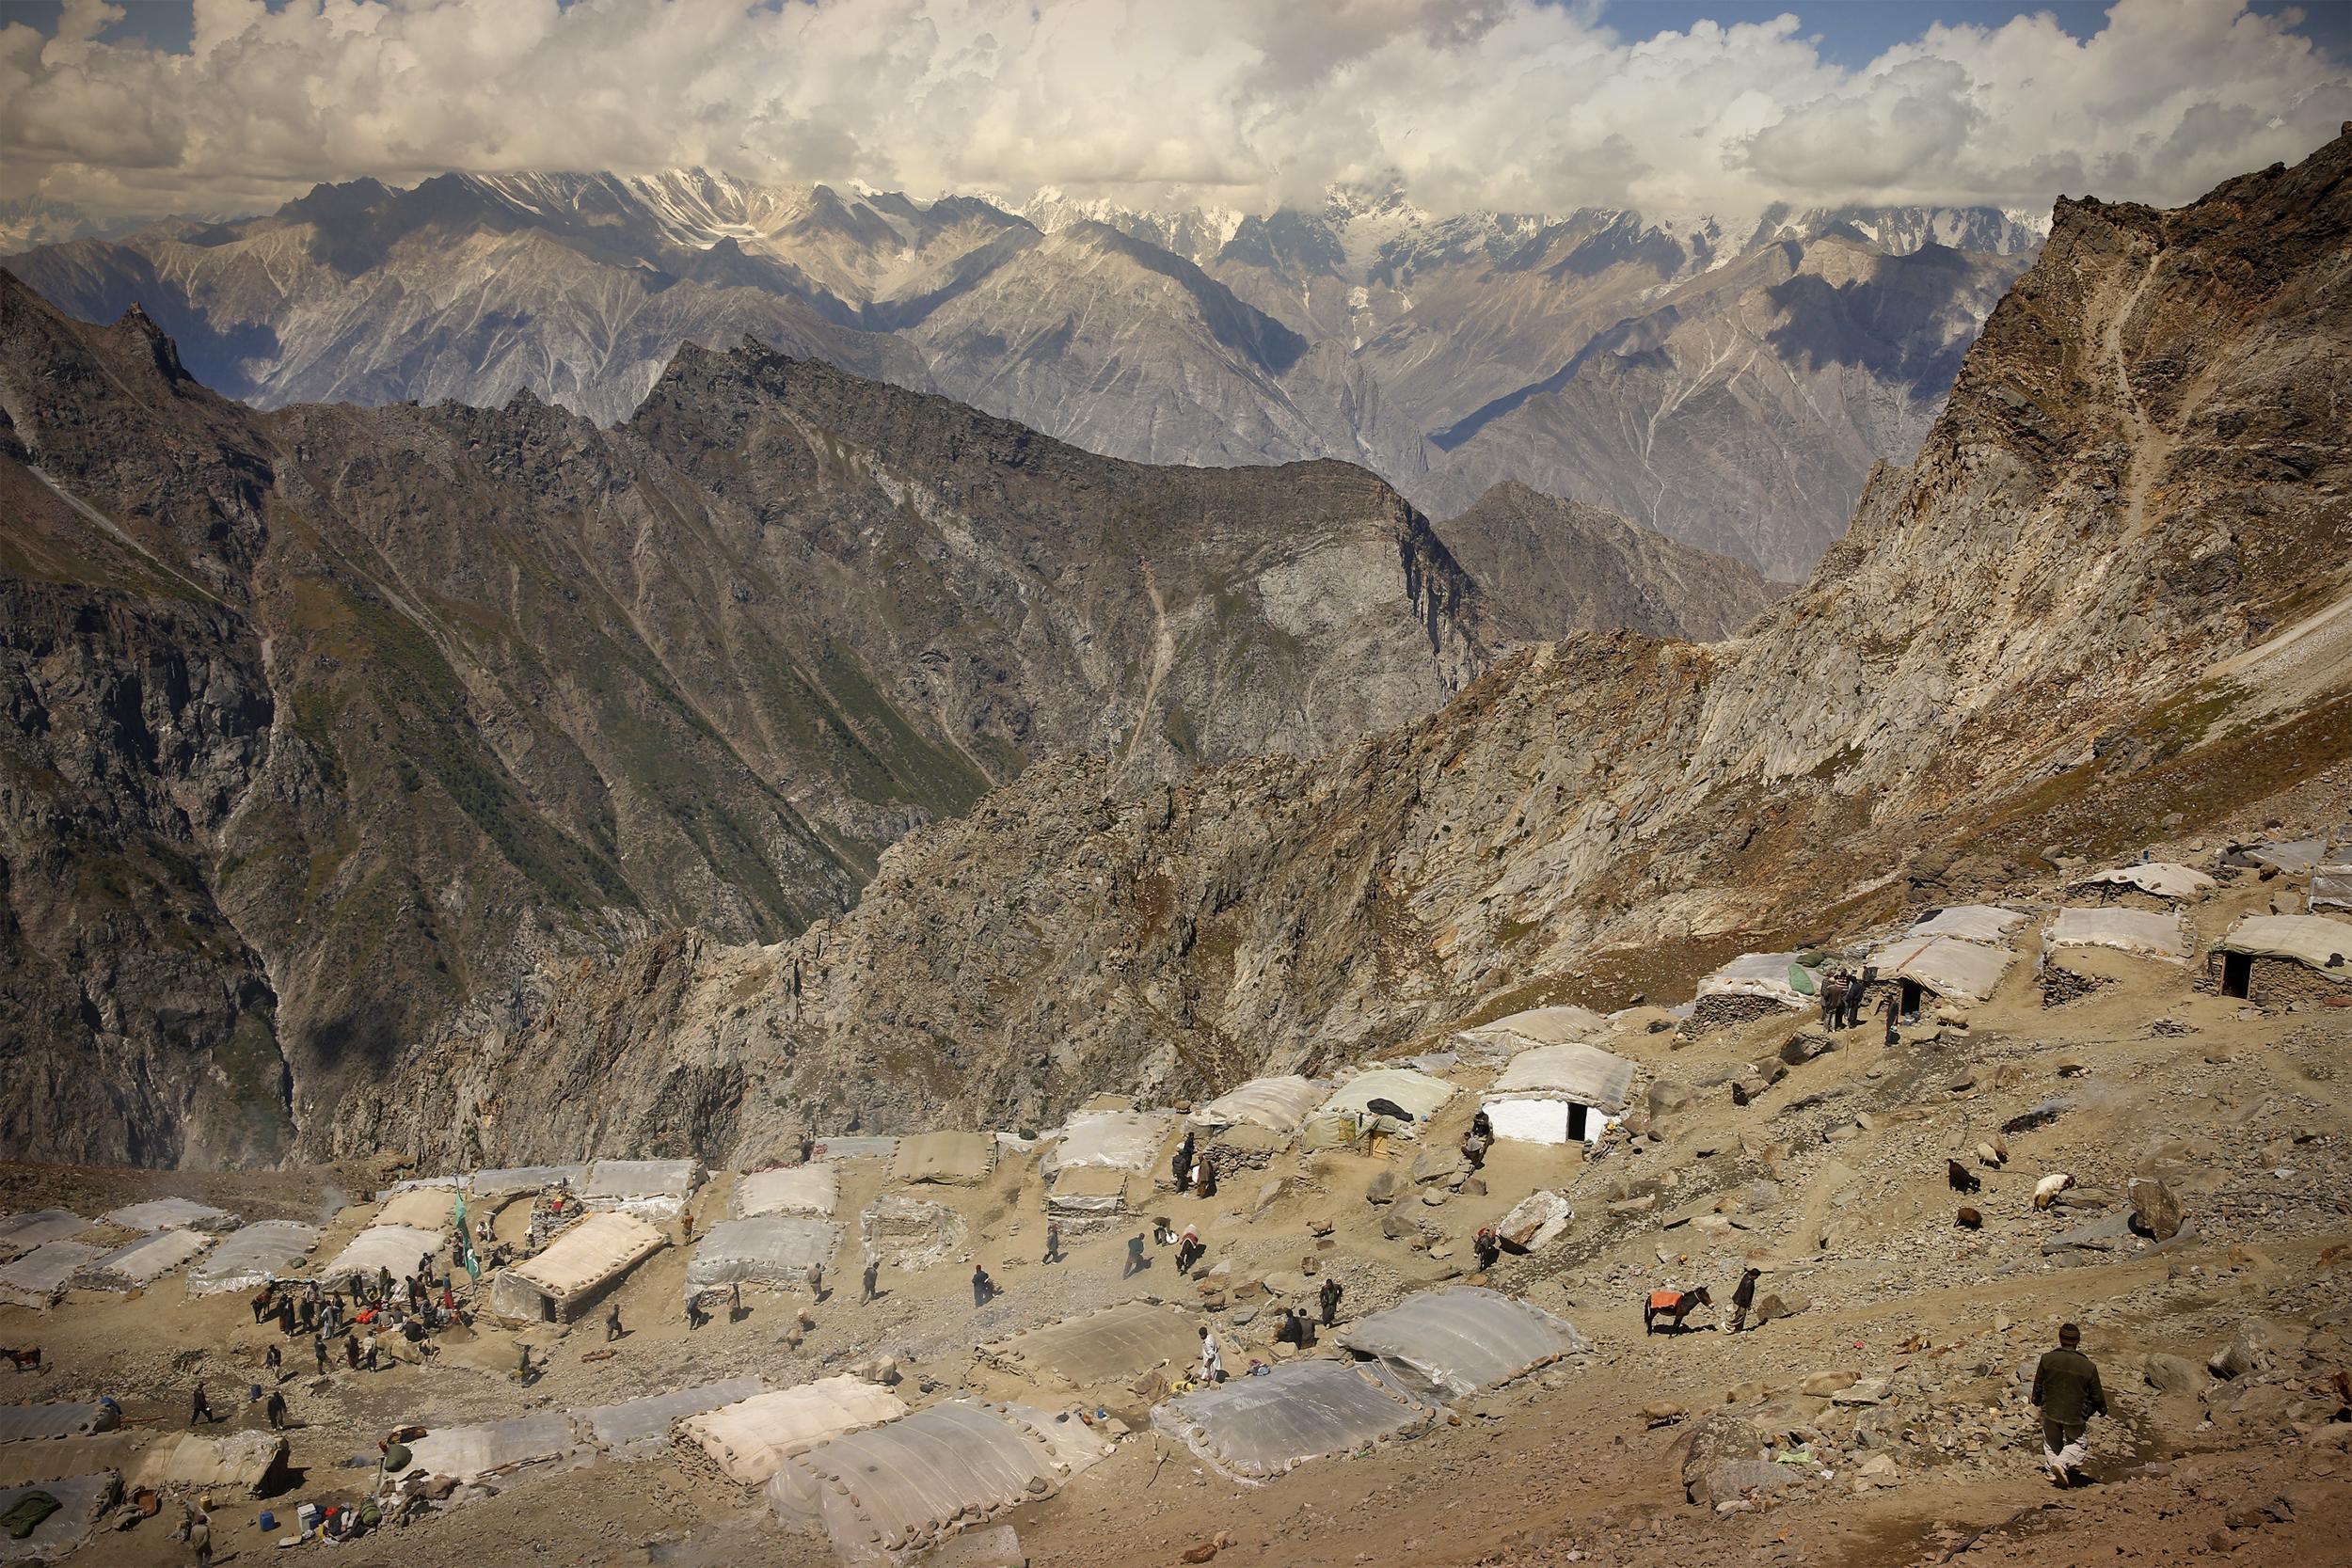 Gemstone Mining Camp, Northern Pakistan, 2015.